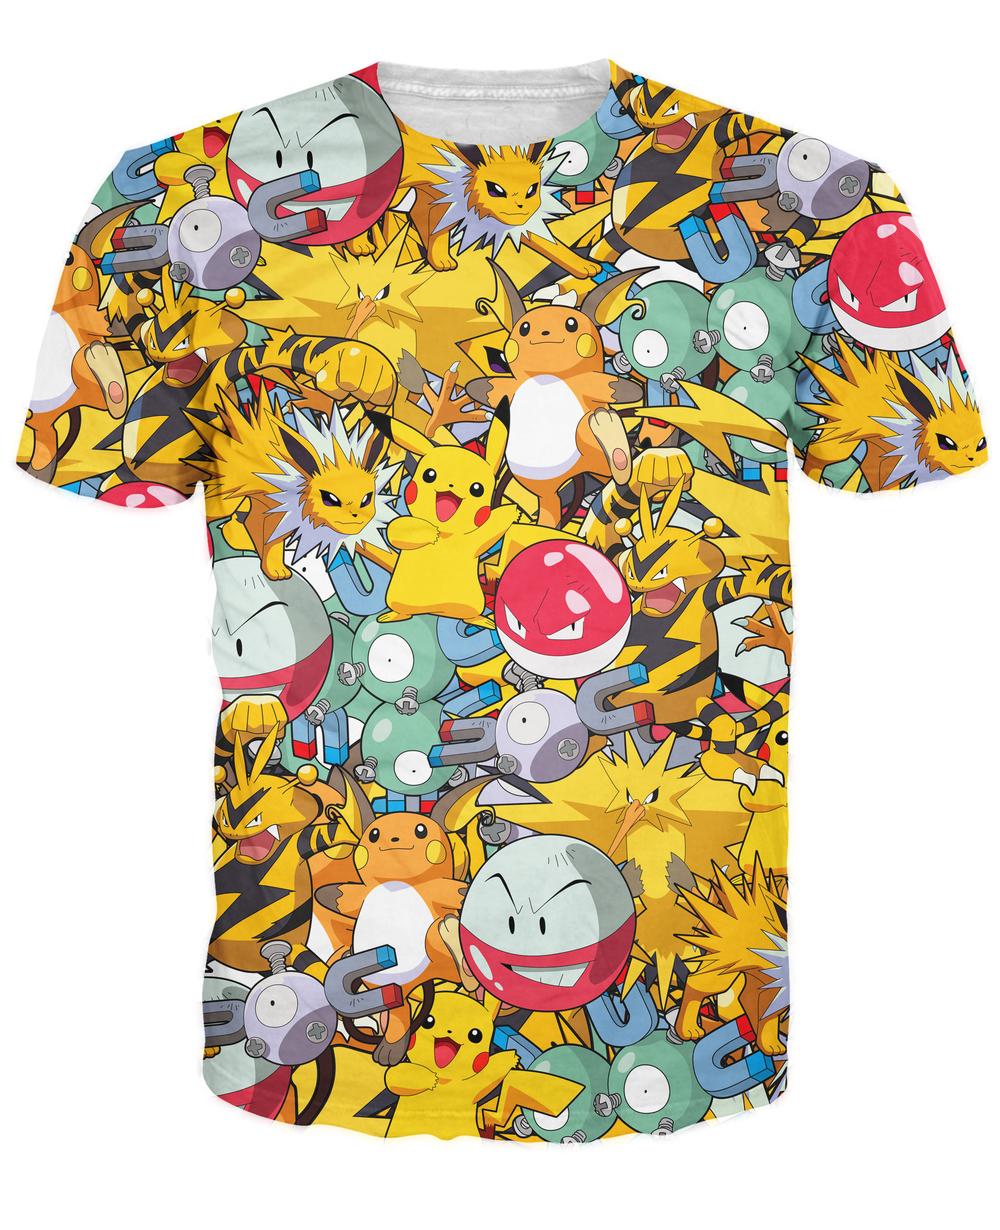 Zapados Pokeball pokemon characters t shir women men Original Electric Pokemon Collage T-Shirt Plus Size S-3XL(China (Mainland))